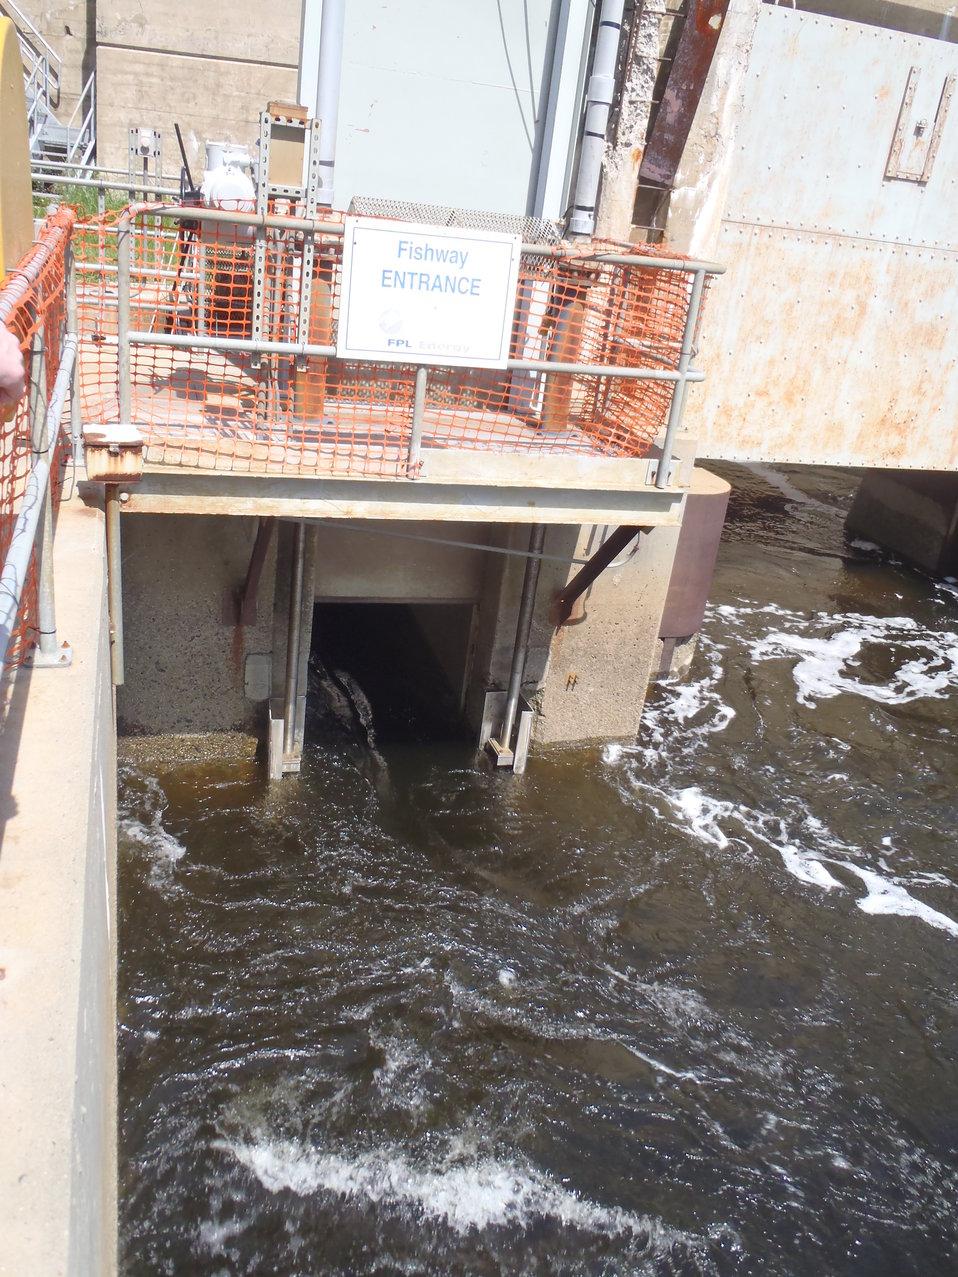 Fish lift entrance on the Saco River